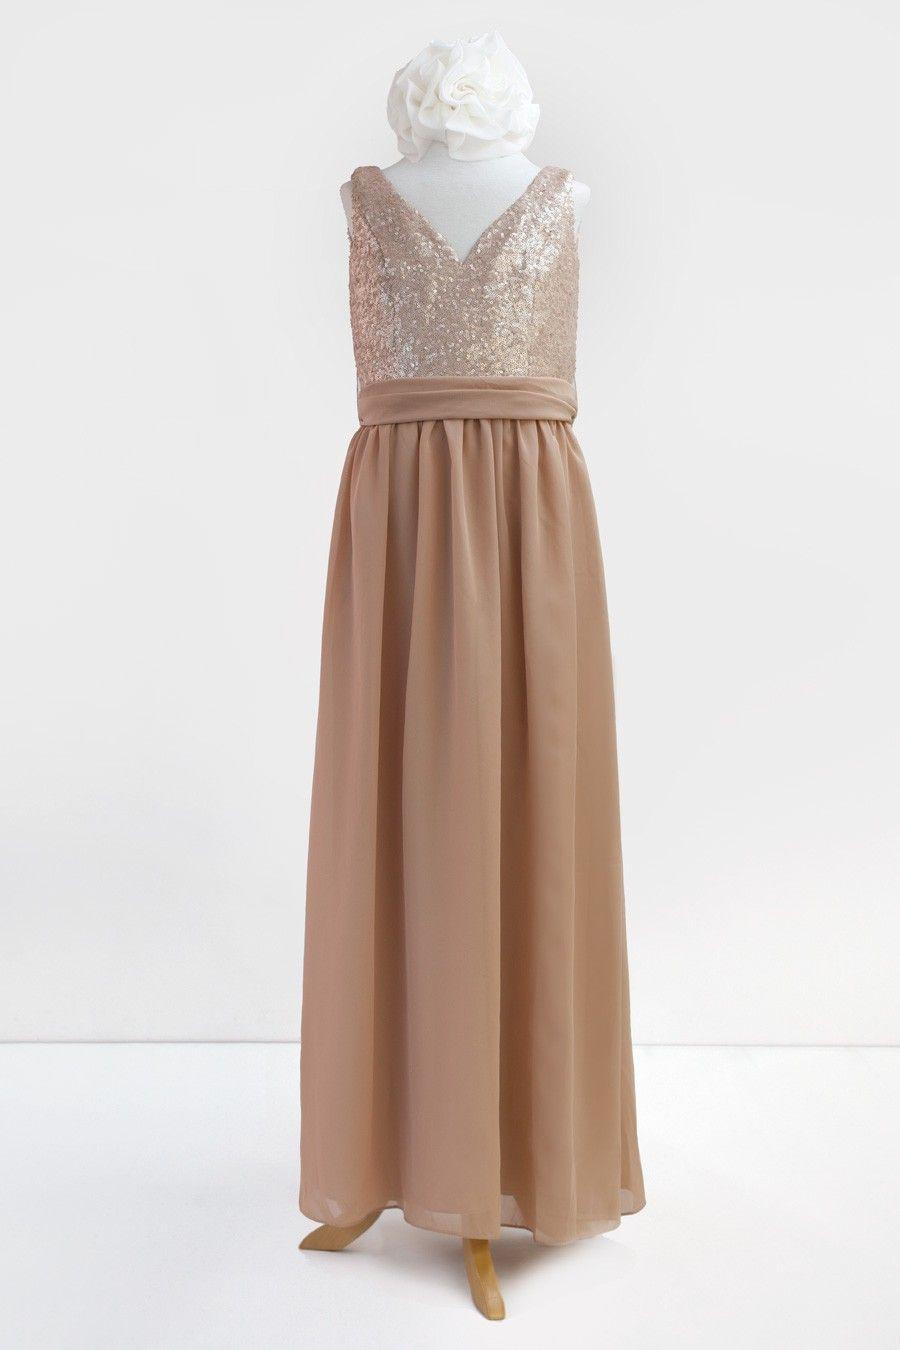 Bari jay 1613jr junior bridesmaid dress megz is gettin hitched bari jay 1613jr junior bridesmaid dress ombrellifo Choice Image